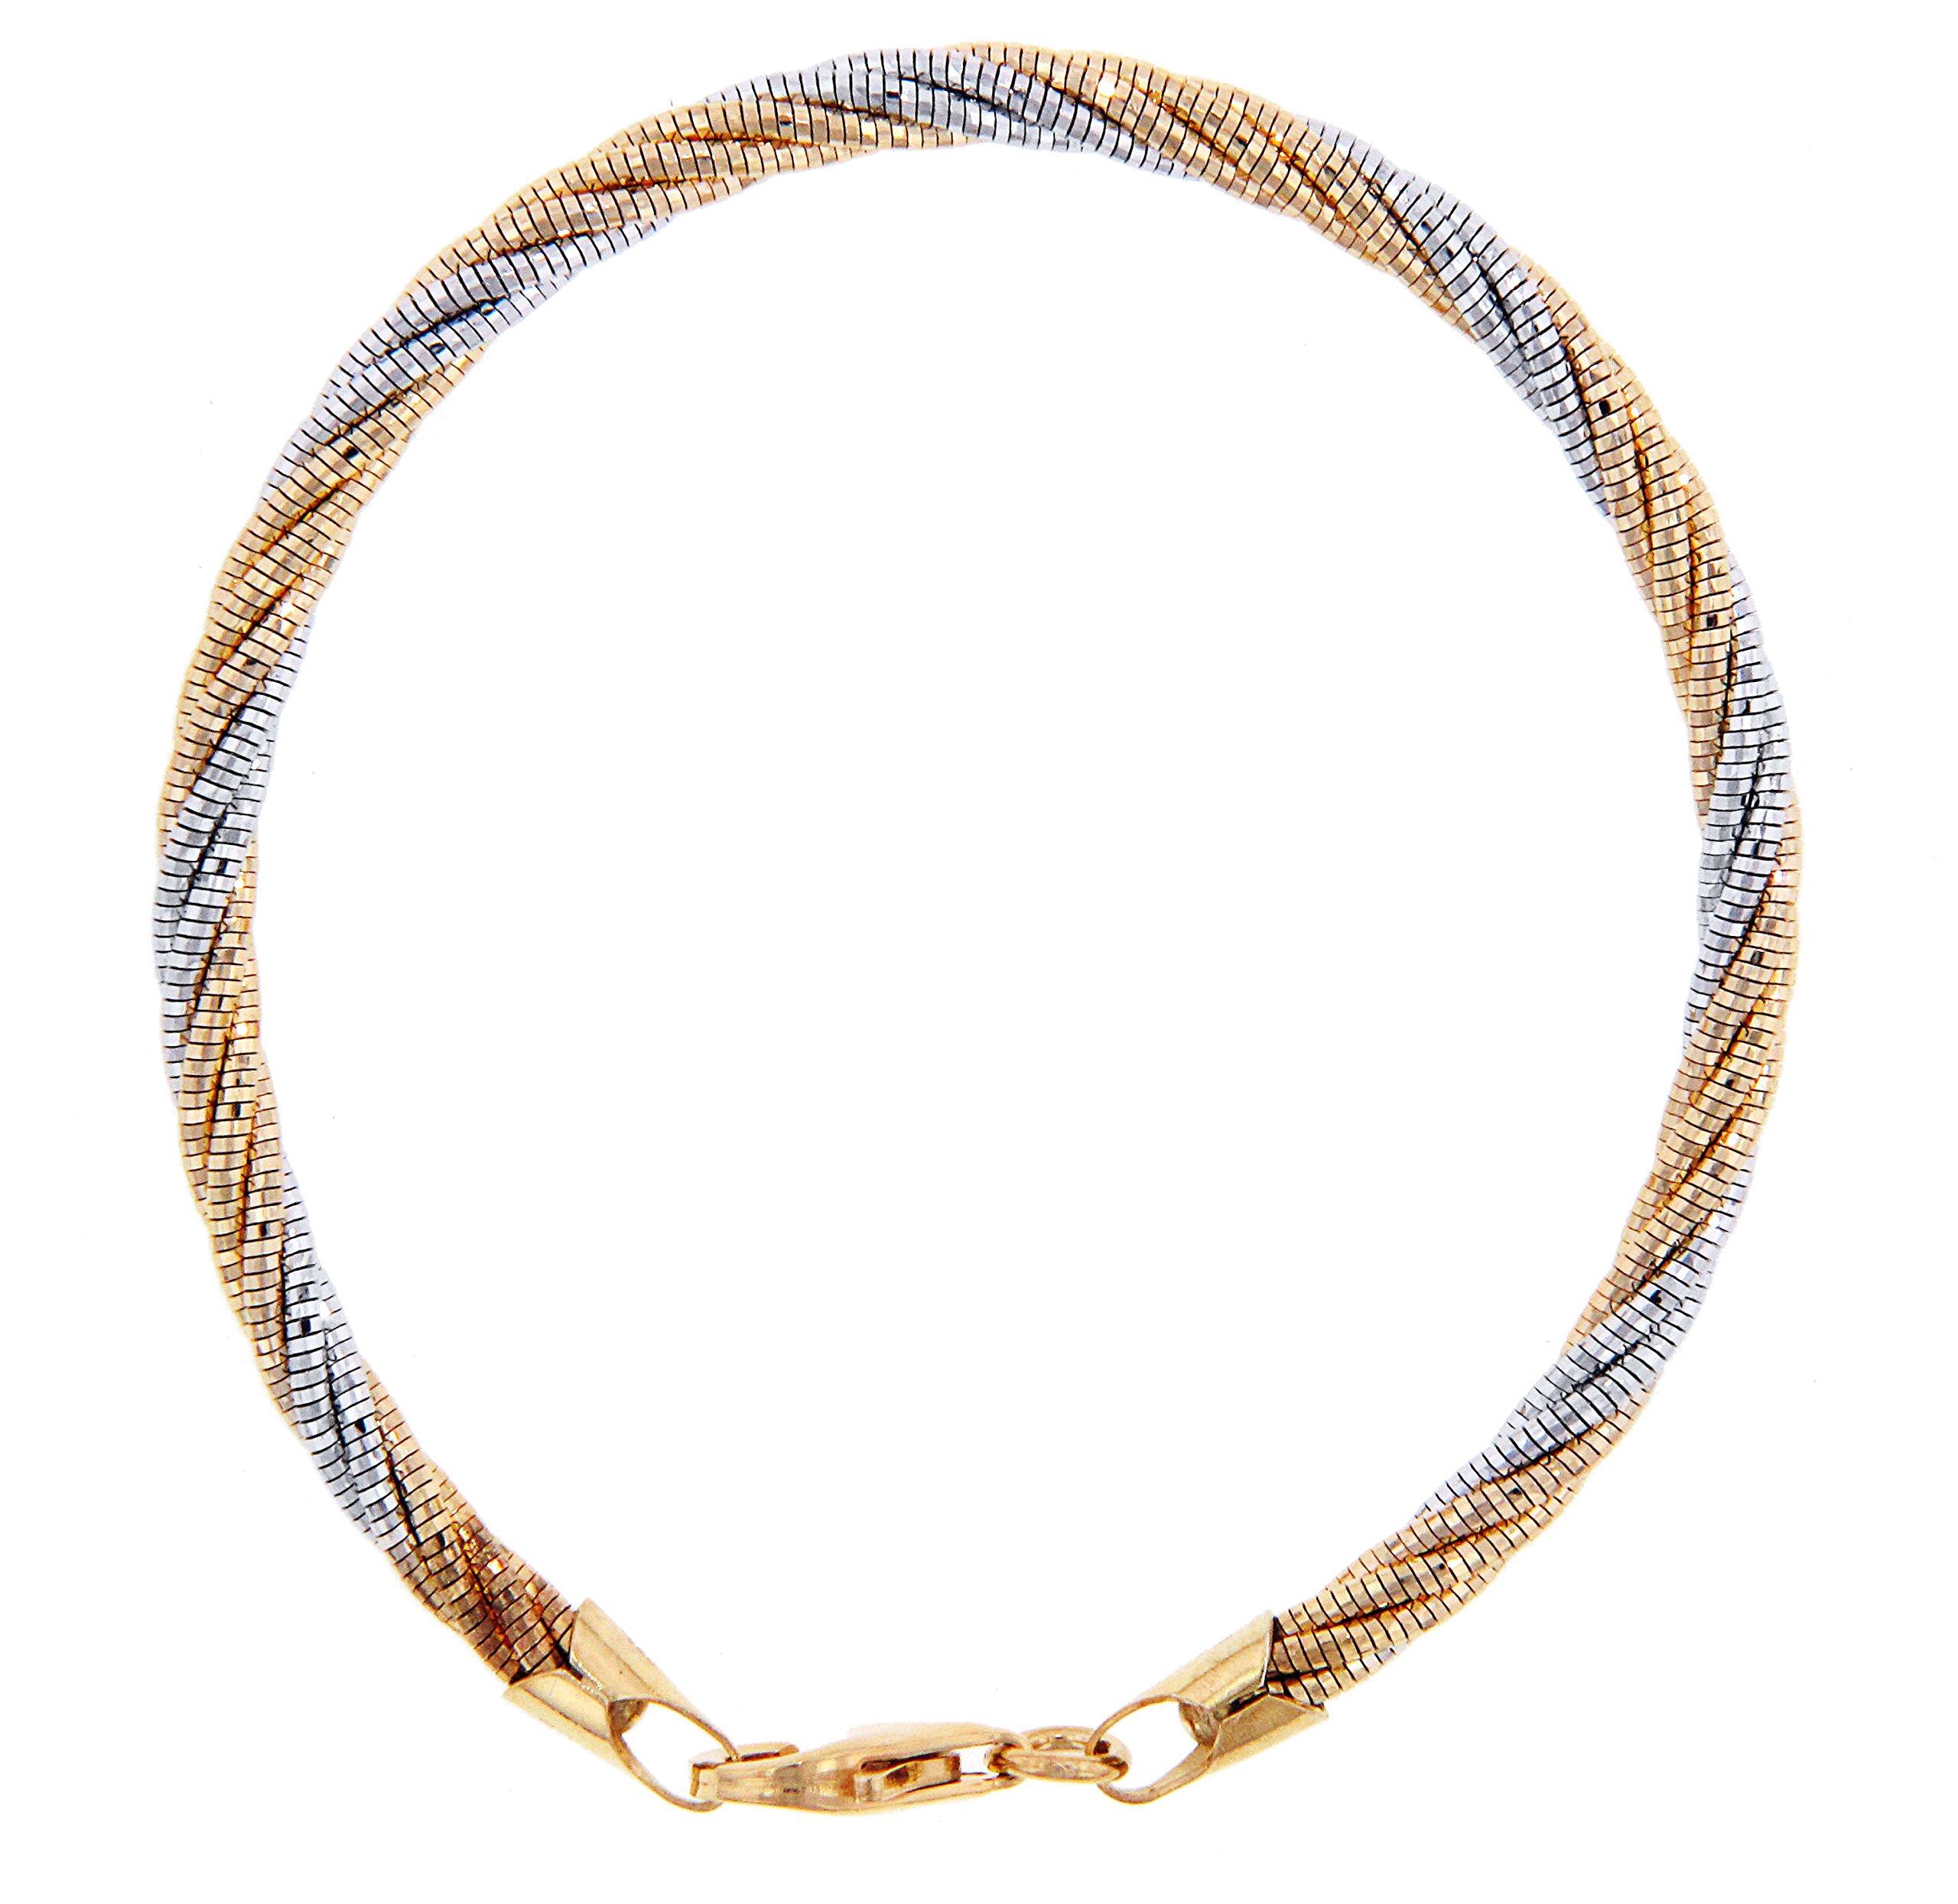 Officina Bernardi Sterling Silver Two-Tone 5 Row Spring Bracelet (7)